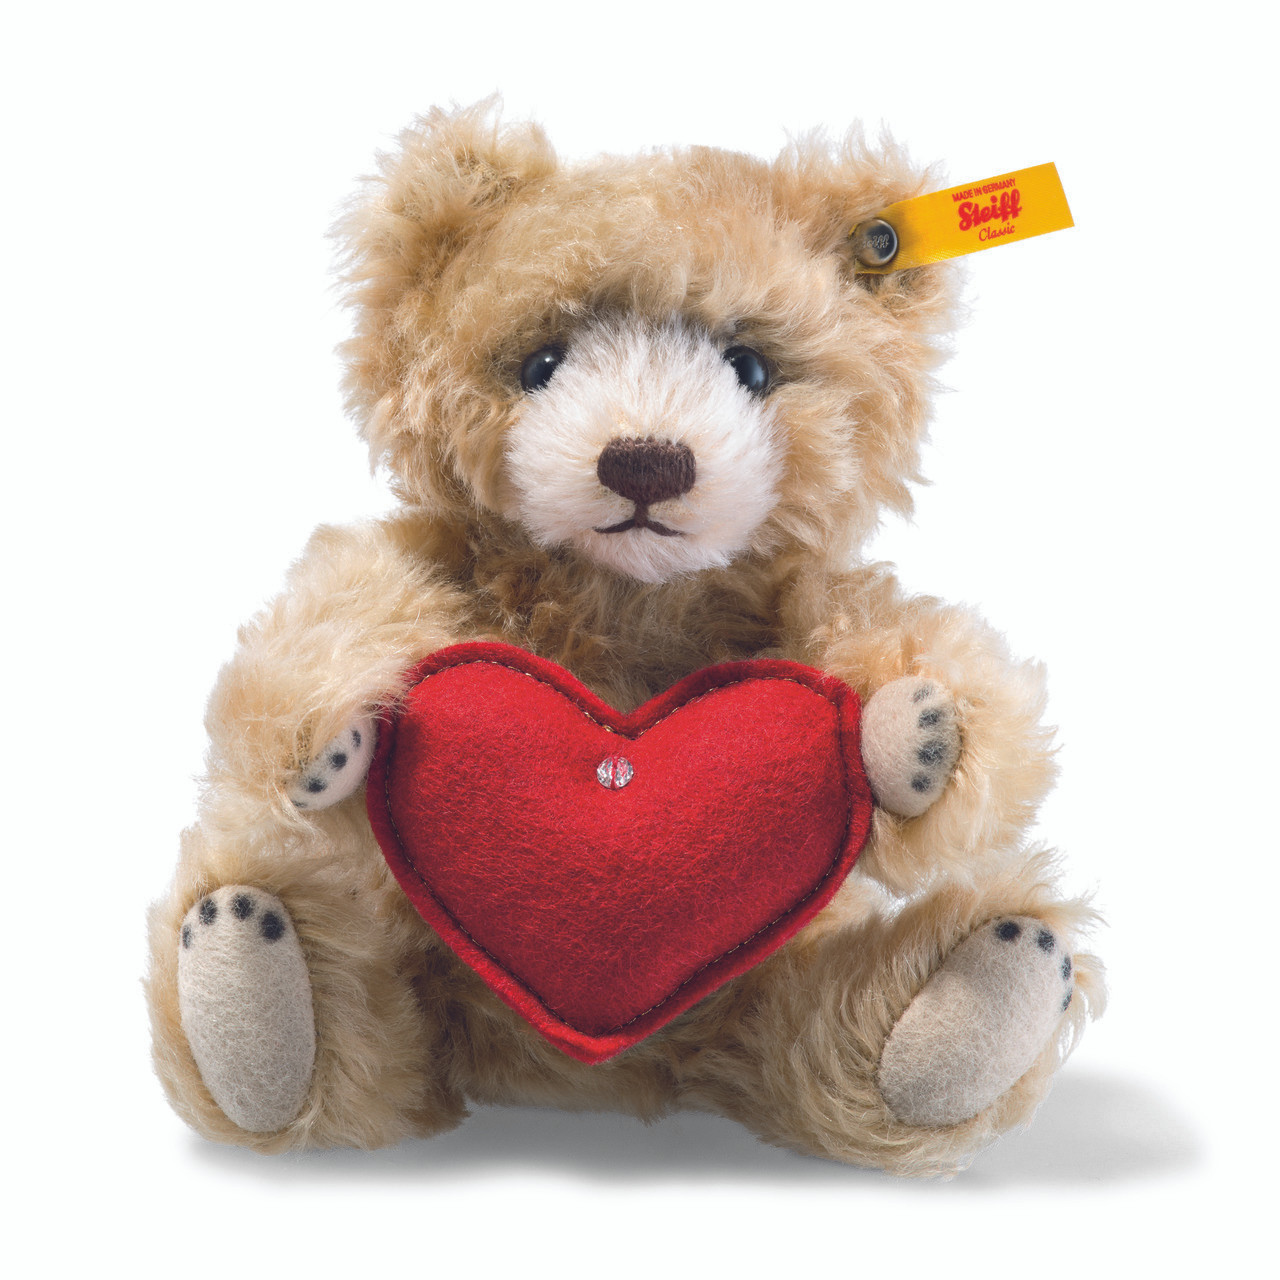 teddy bear with heart steiff online shop usa. Black Bedroom Furniture Sets. Home Design Ideas